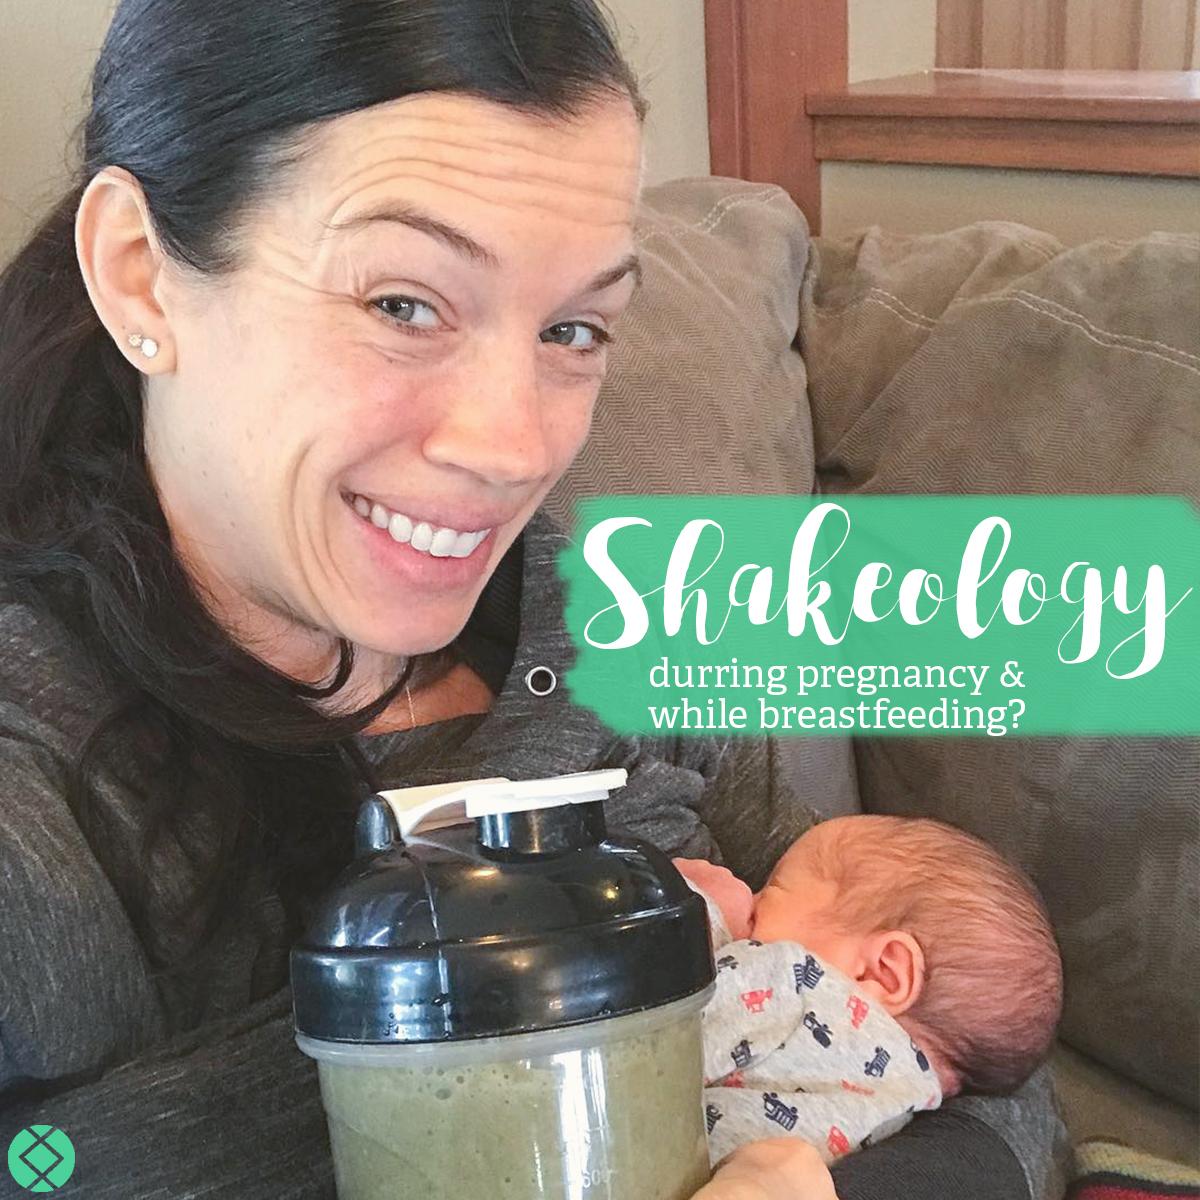 shakeology replacement for prenatal vitamins